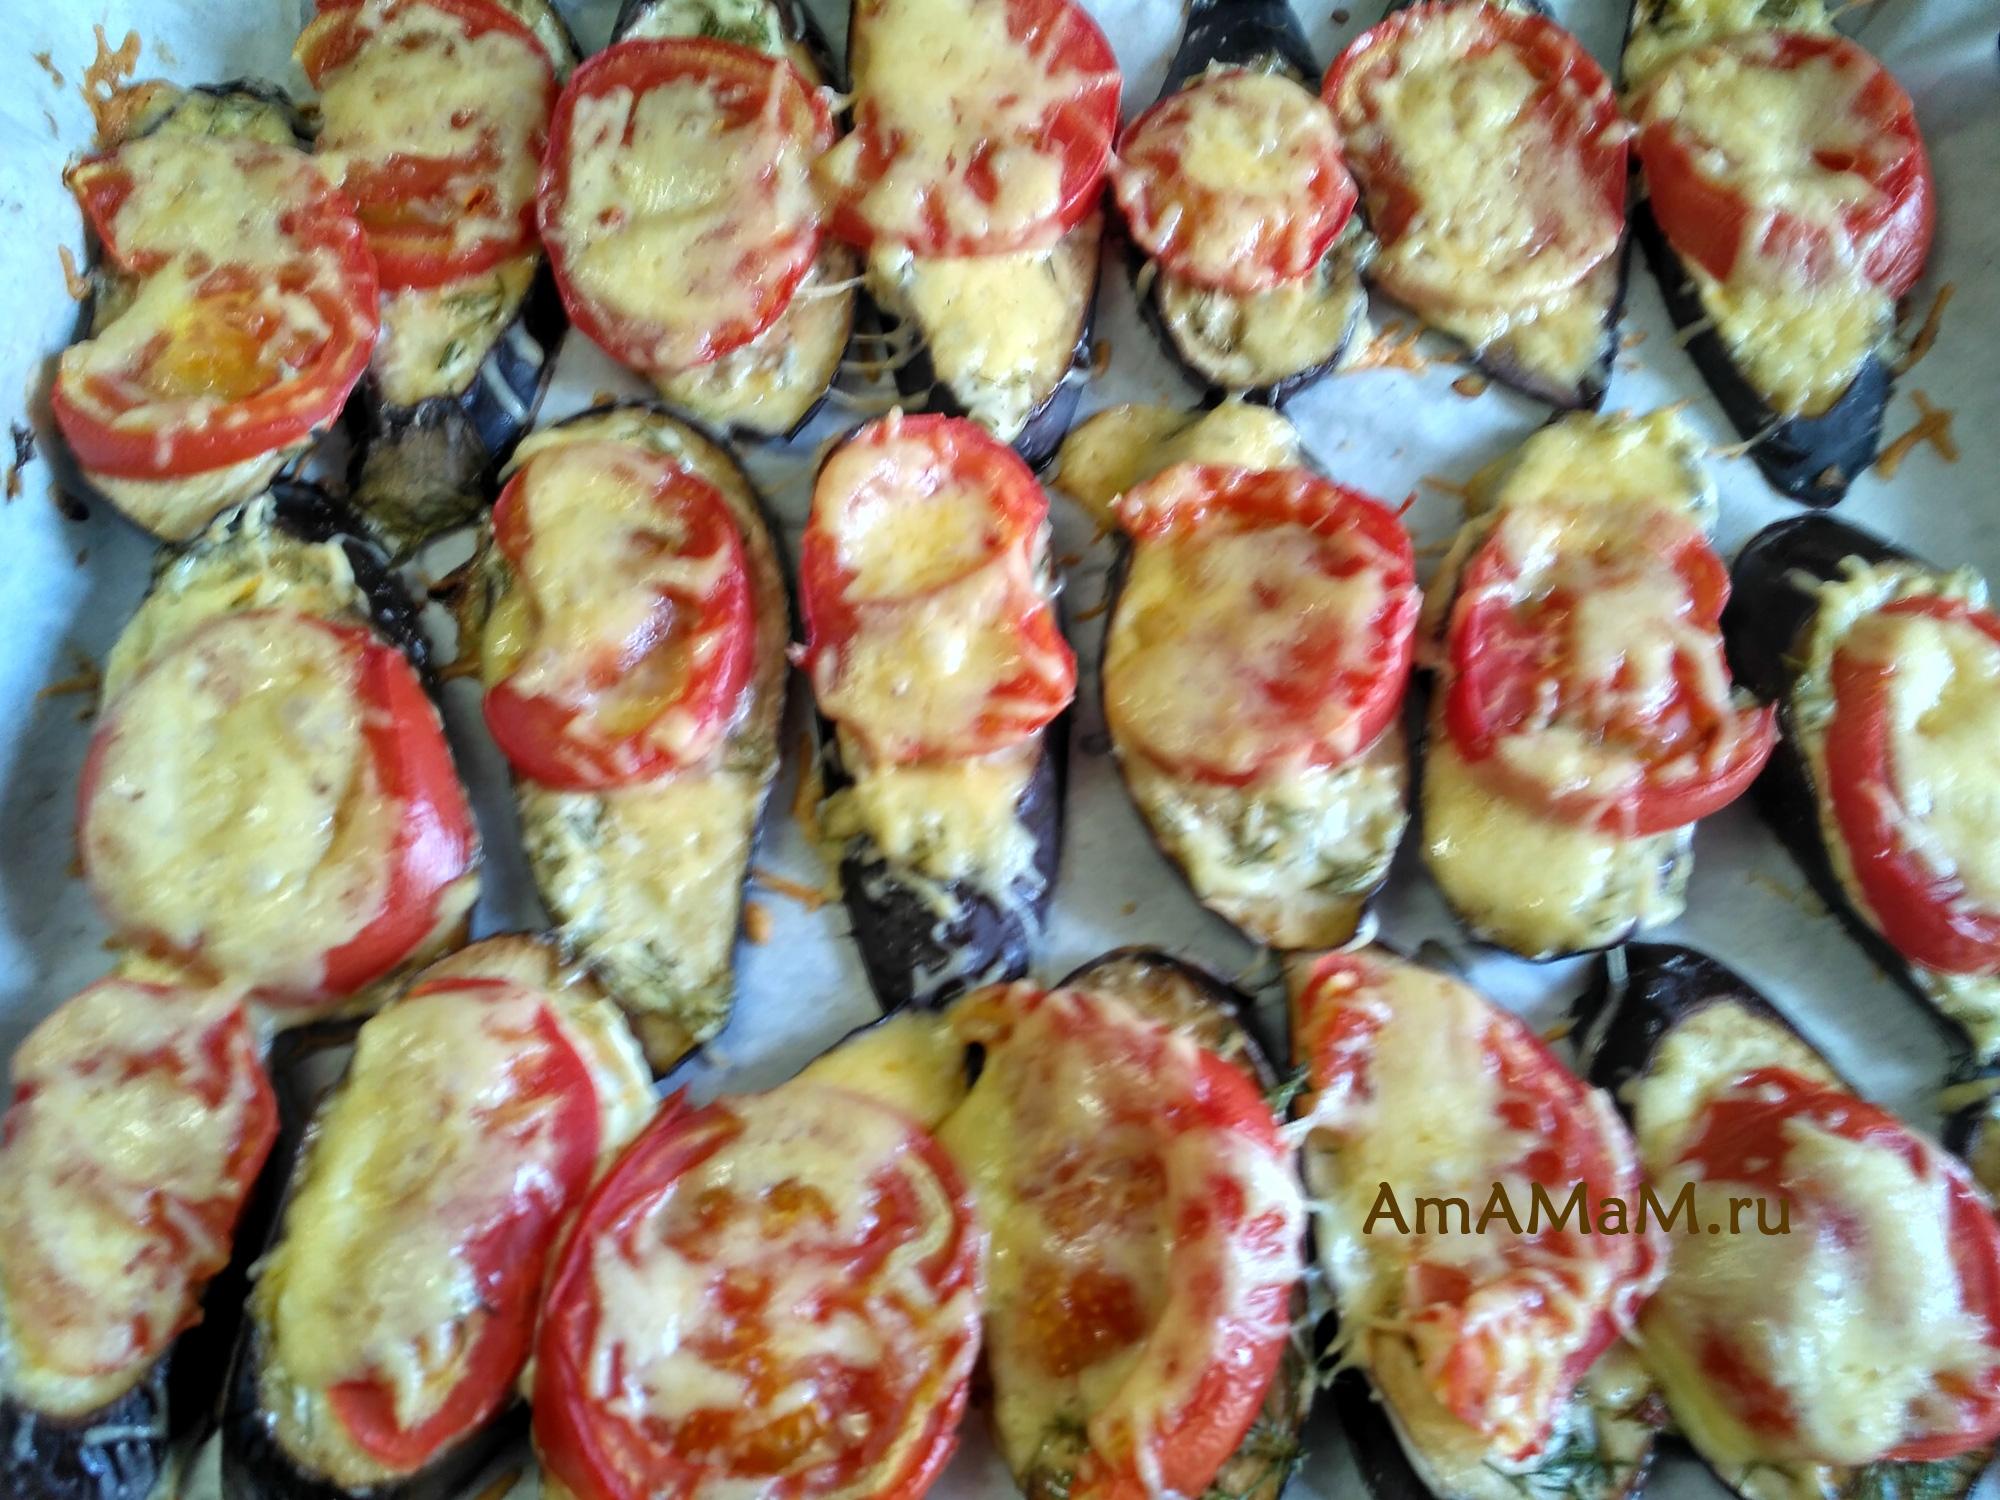 Баклажан с помидором и чесноком сыром и майонезом